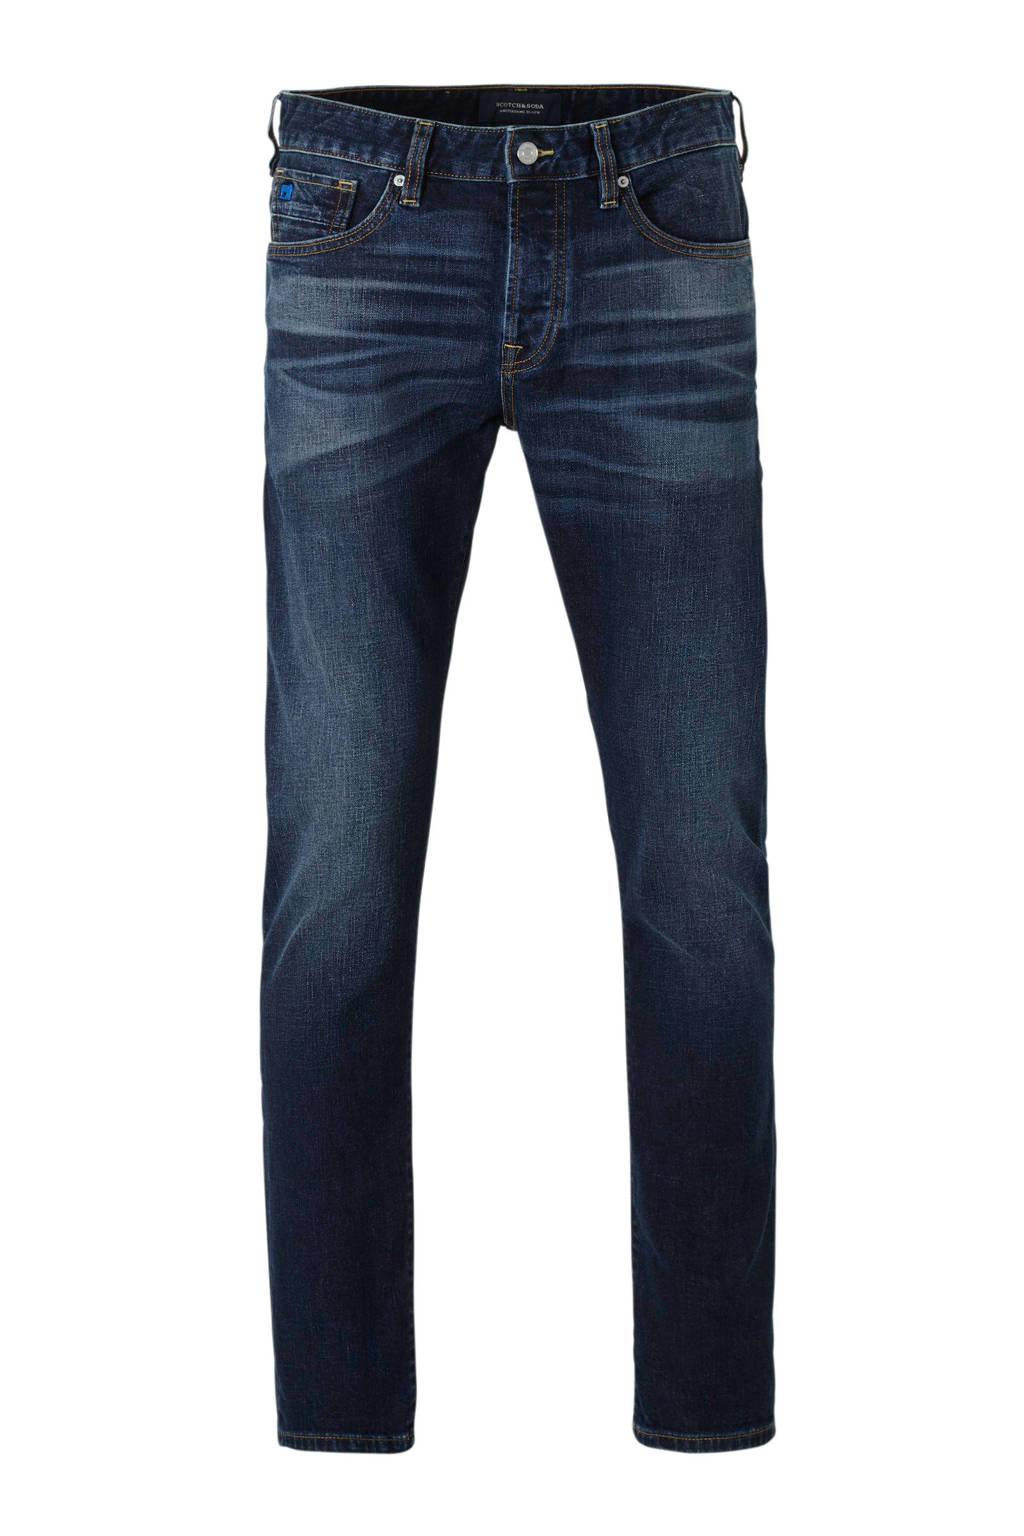 Scotch & Soda Amsterdams Blauw regular fit jeans Ralston donkerblauw 63000, Donkerblauw 63000